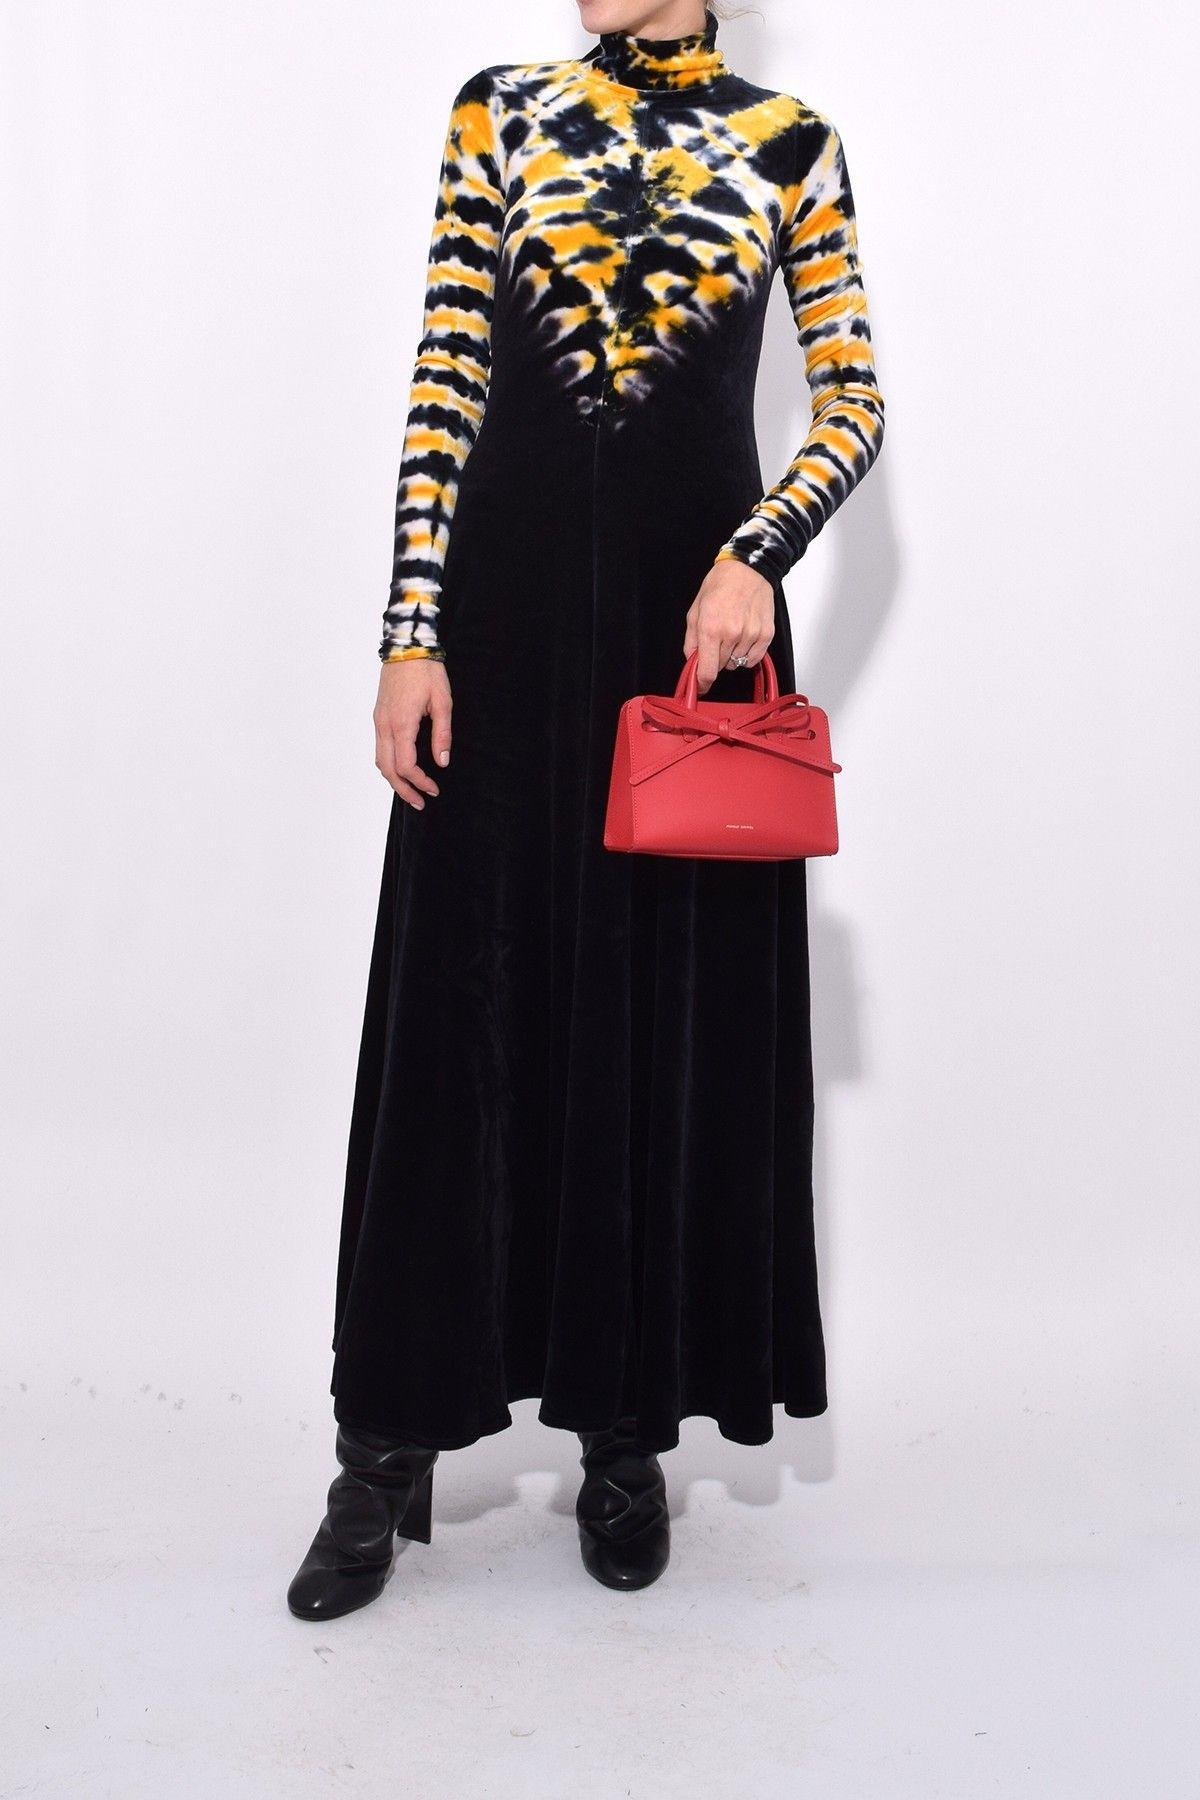 Long sleeve turtleneck dress in yellowblack just in pinterest